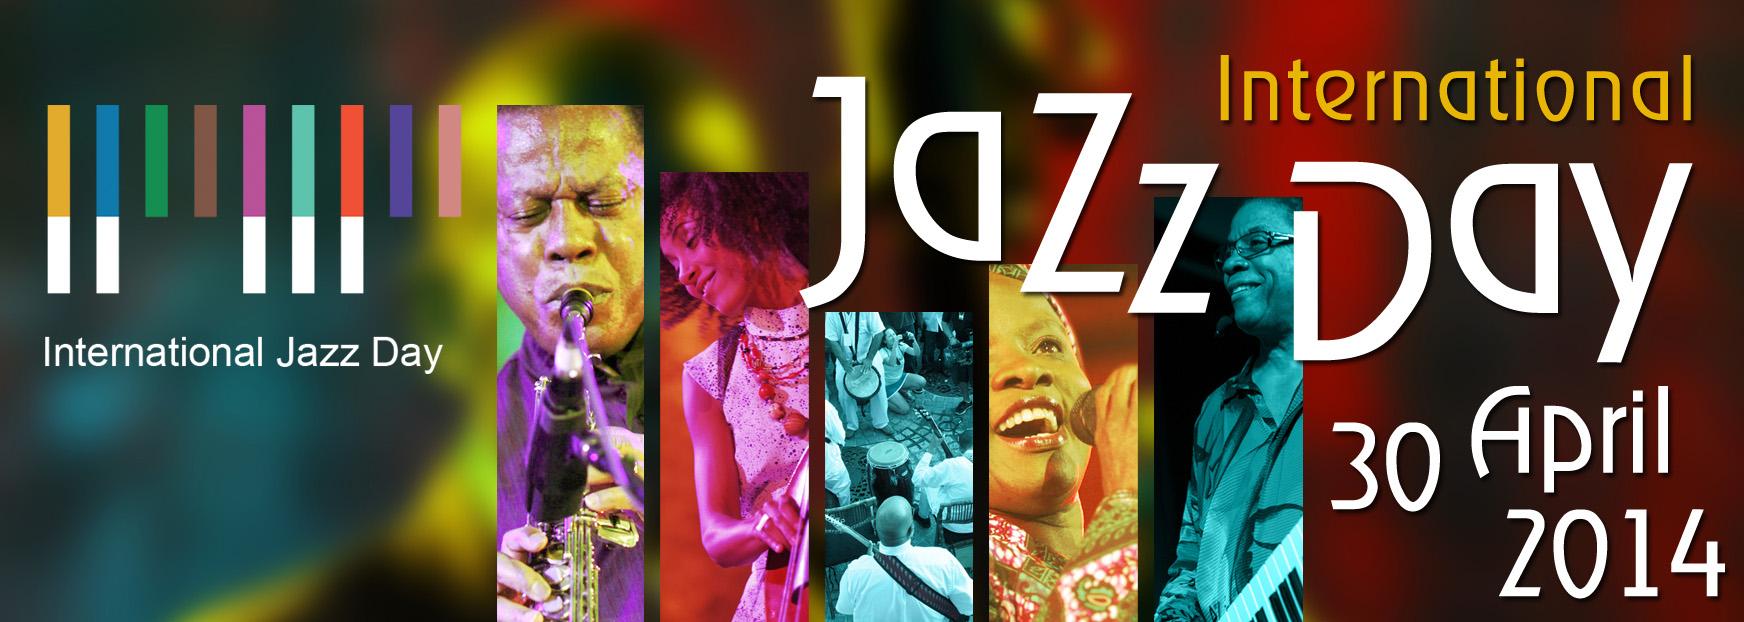 Jazz-Day-Giornata-Internazionale-UNESCO-del-Jazz